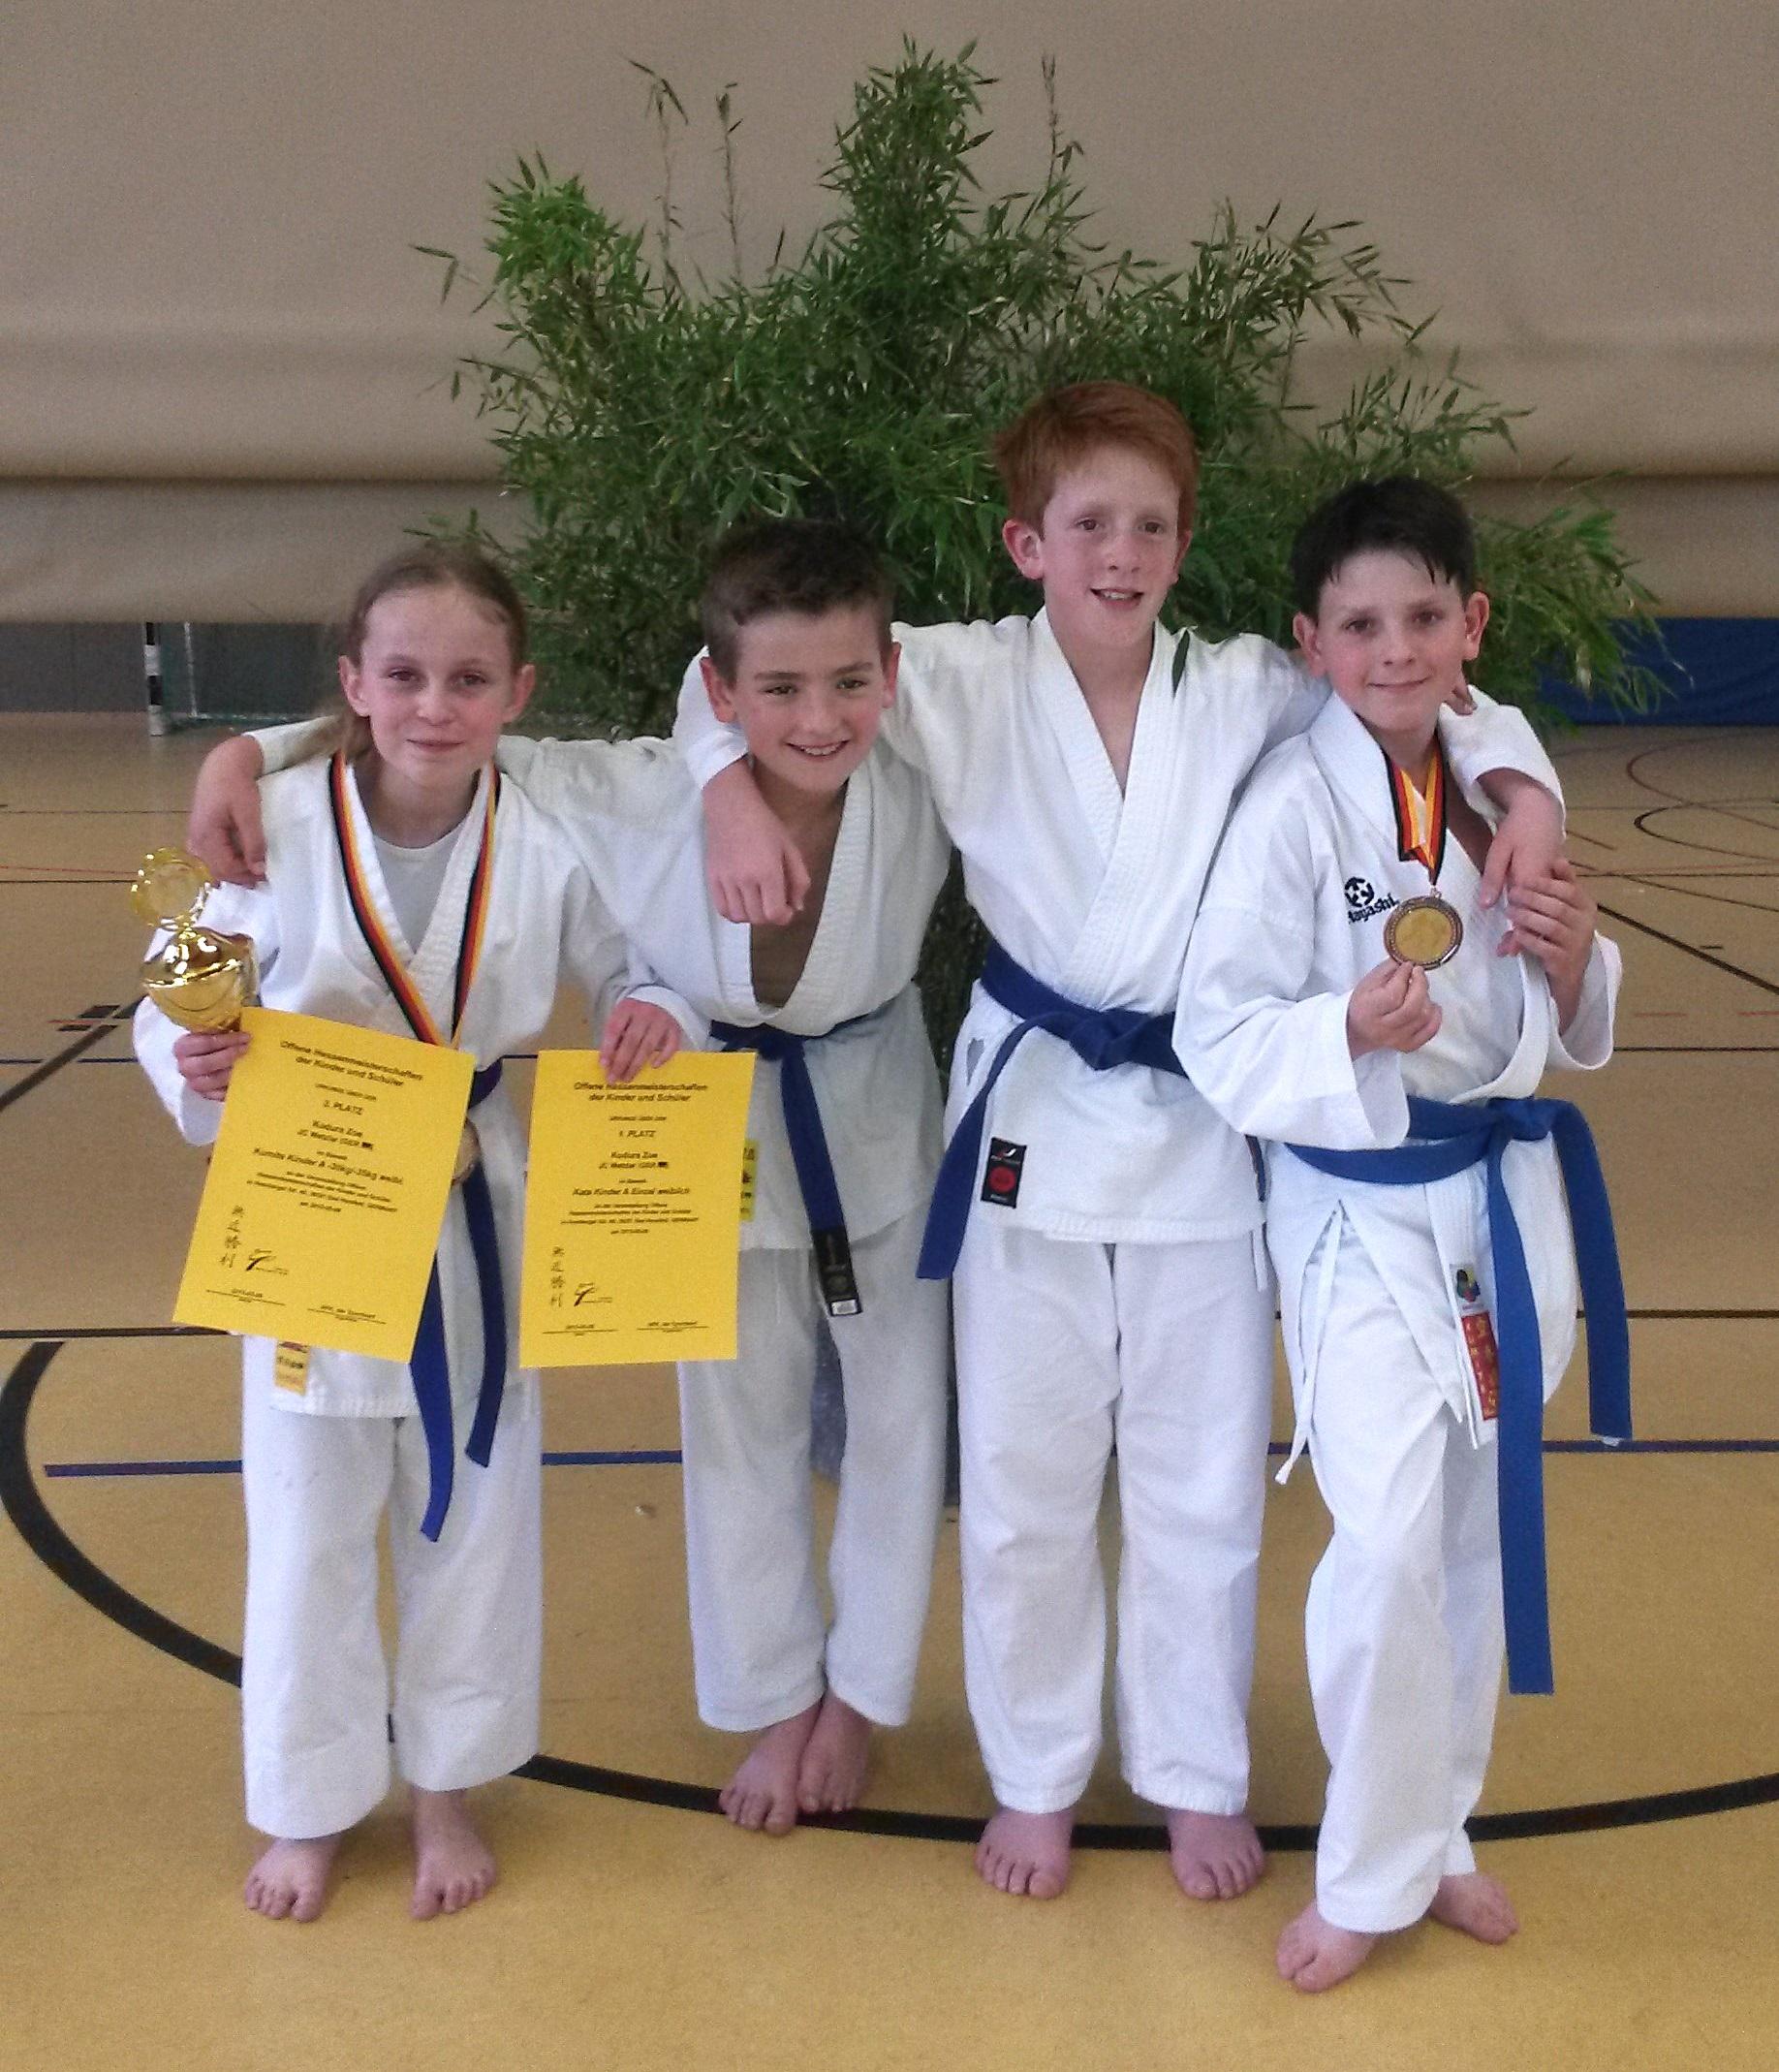 Von links nach rechts: Zoe Kodura Kian Hanker Daniel Conrad Cevin Nitschke.